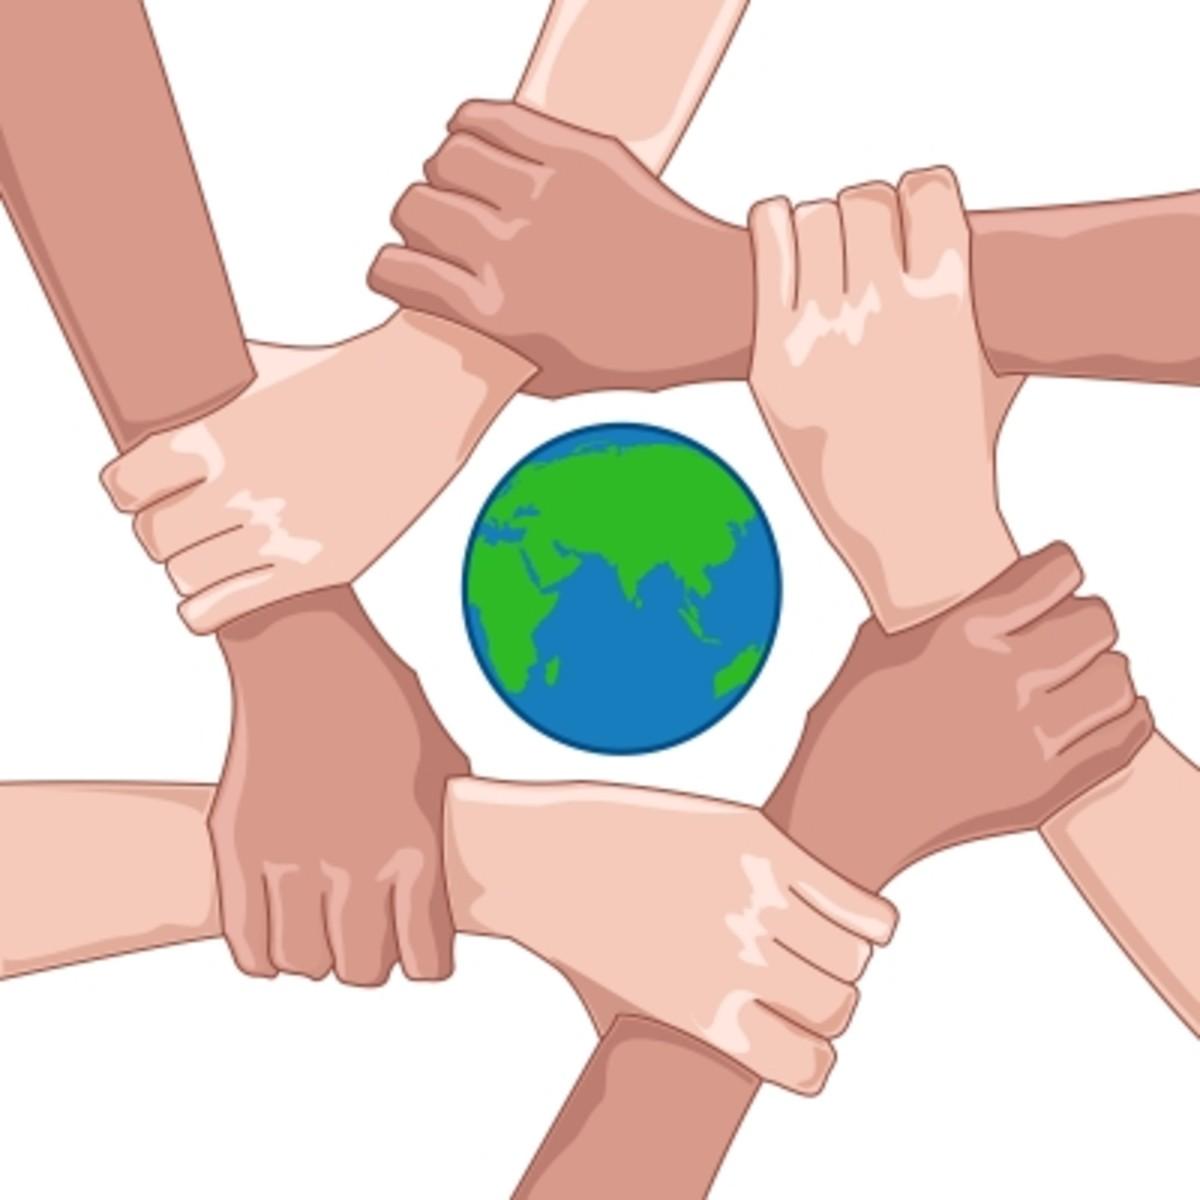 Using Robert Kohls' American Values to Start a Green Revolution -